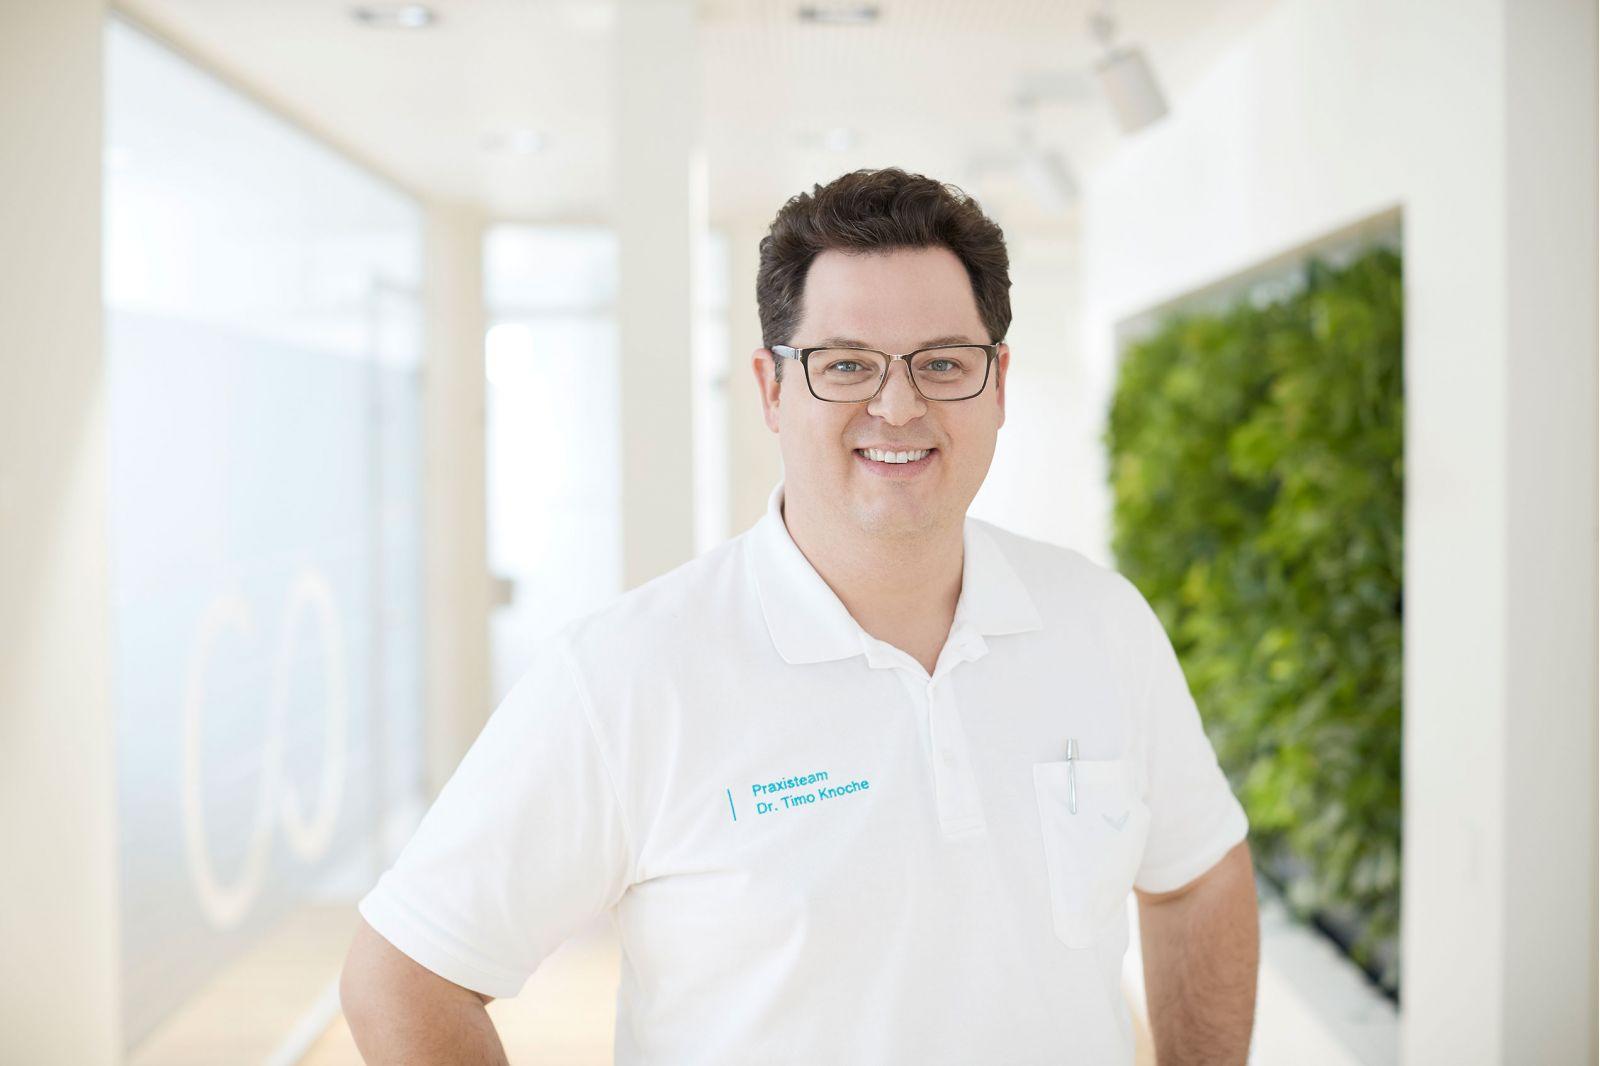 Zahnarzt Dr. med. dent. Time Knoche Zahnarztpraxis confident Esslingen